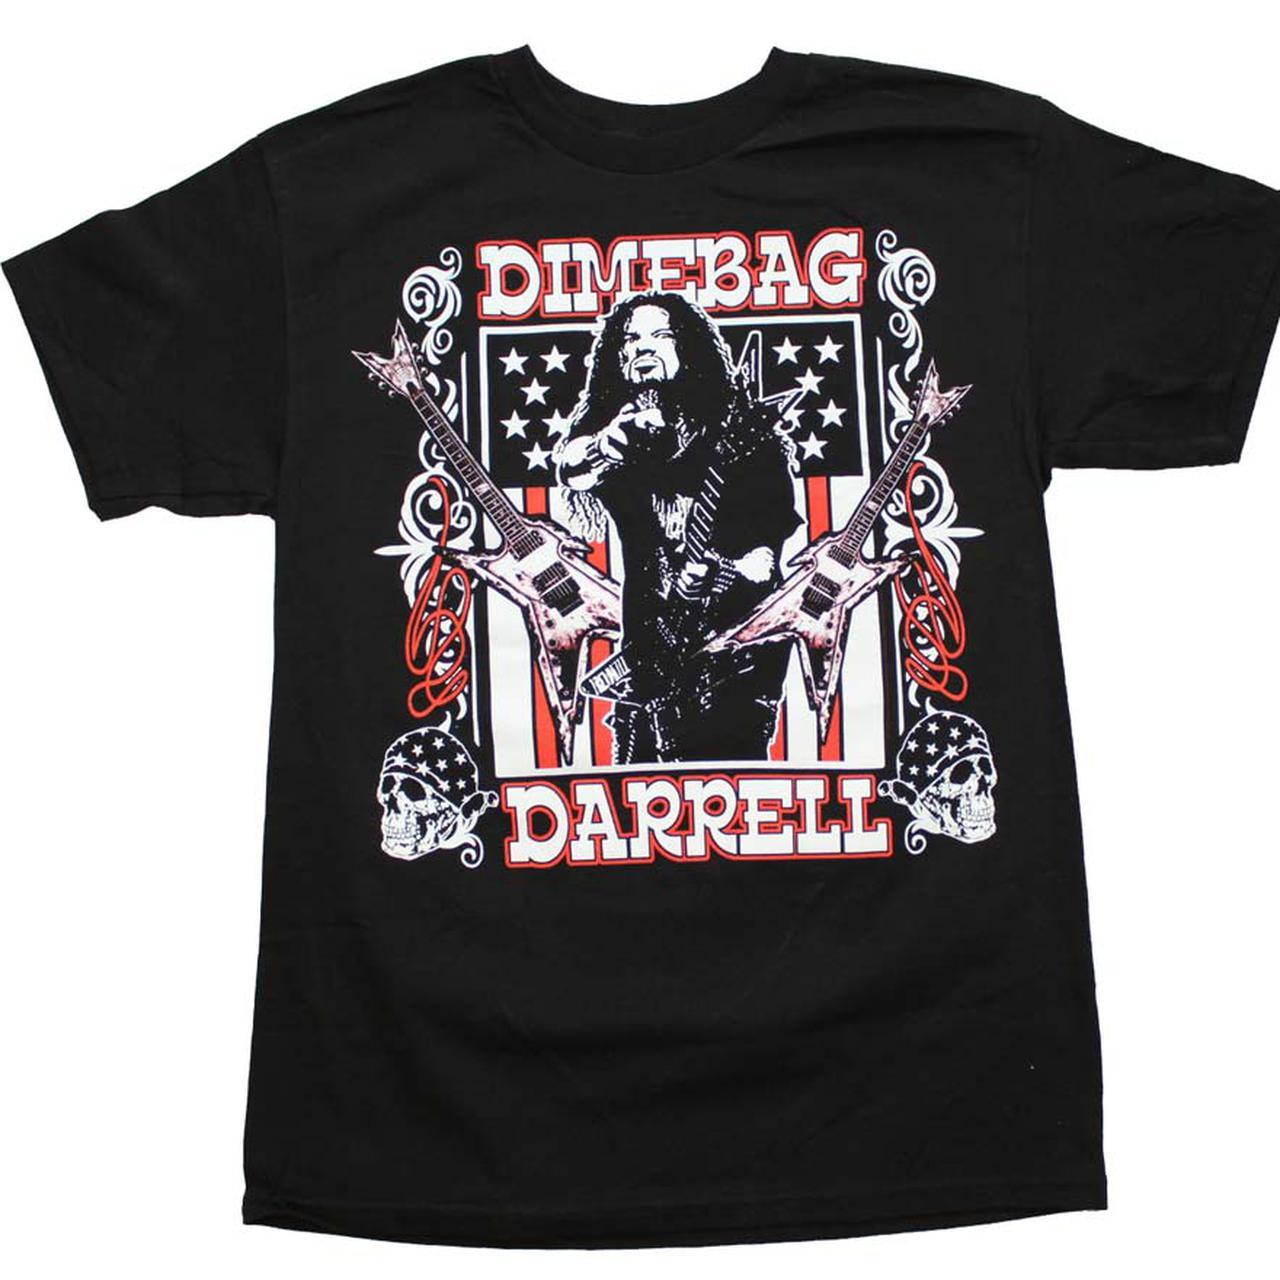 Black flag t shirt europe - Pantera T Shirt Dimebag Darrell Guitars Flag